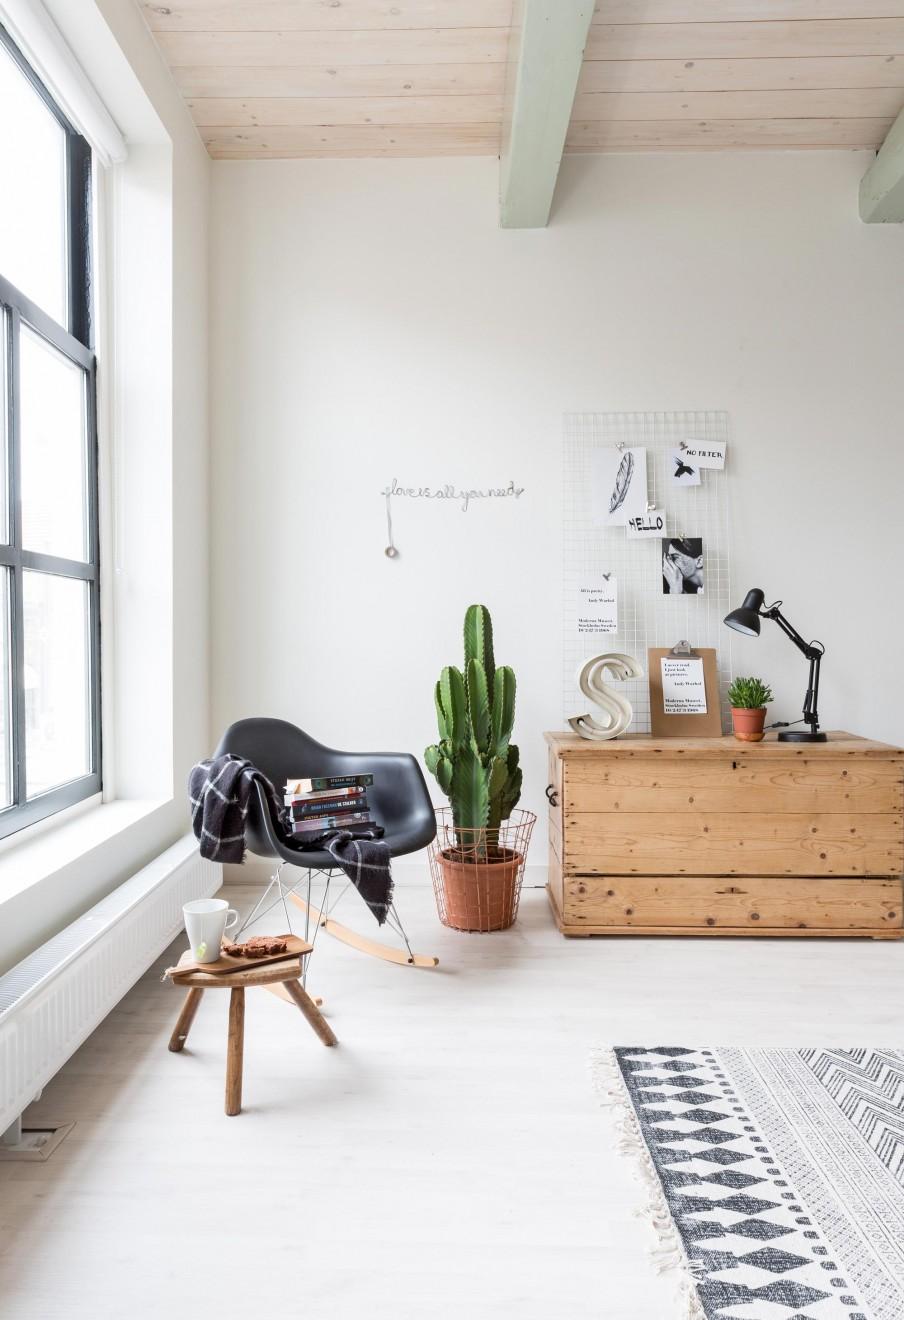 Visite Une Maison Scandinave Et Minimaliste Lili In Wonderland